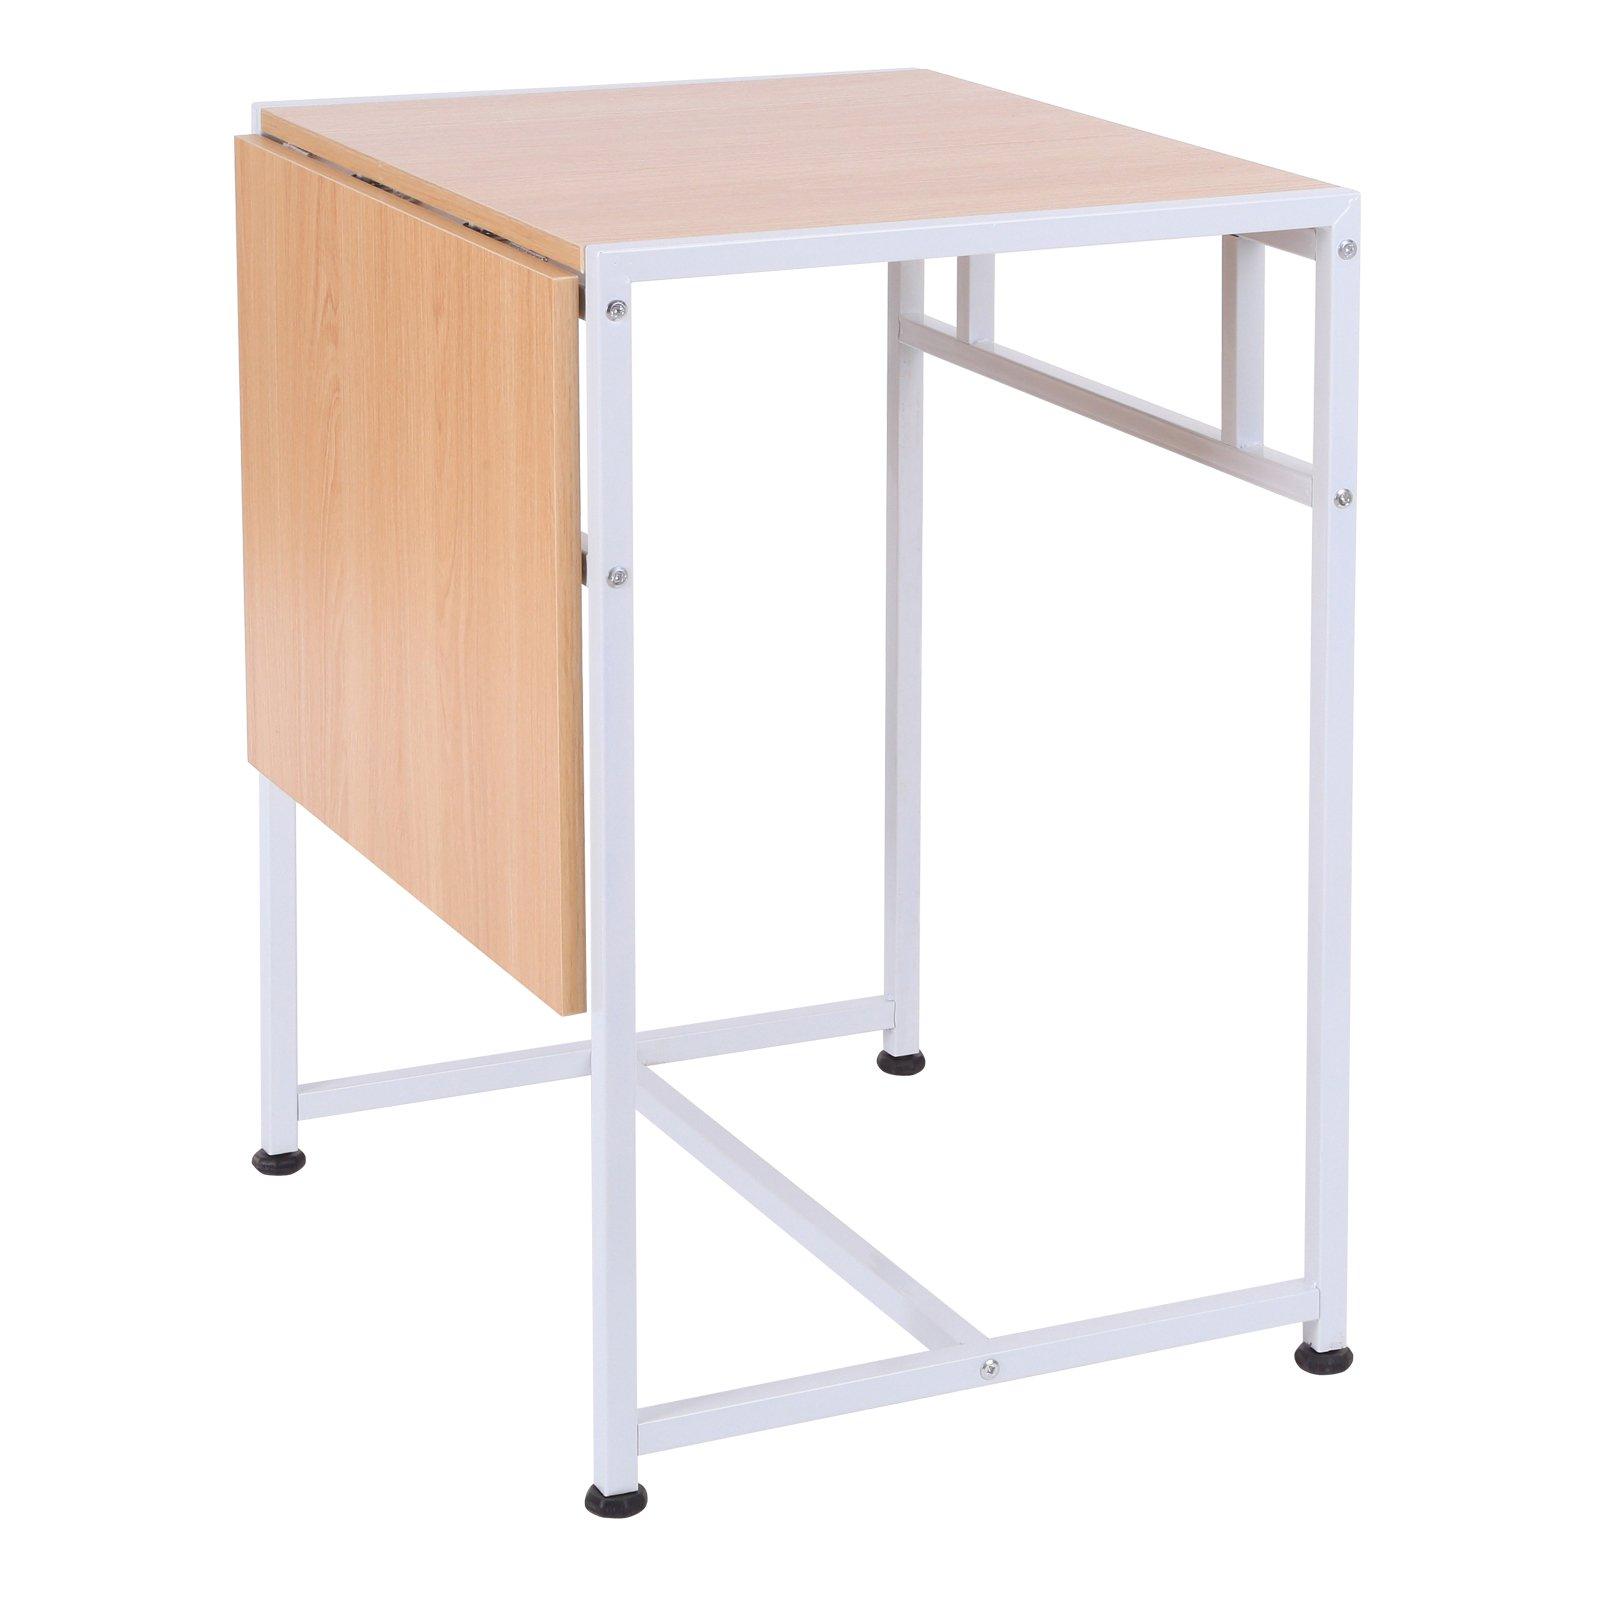 HOMCOM 36'' Wood Top Drop Leaf Computer Office Desk Folding End Side Table - White